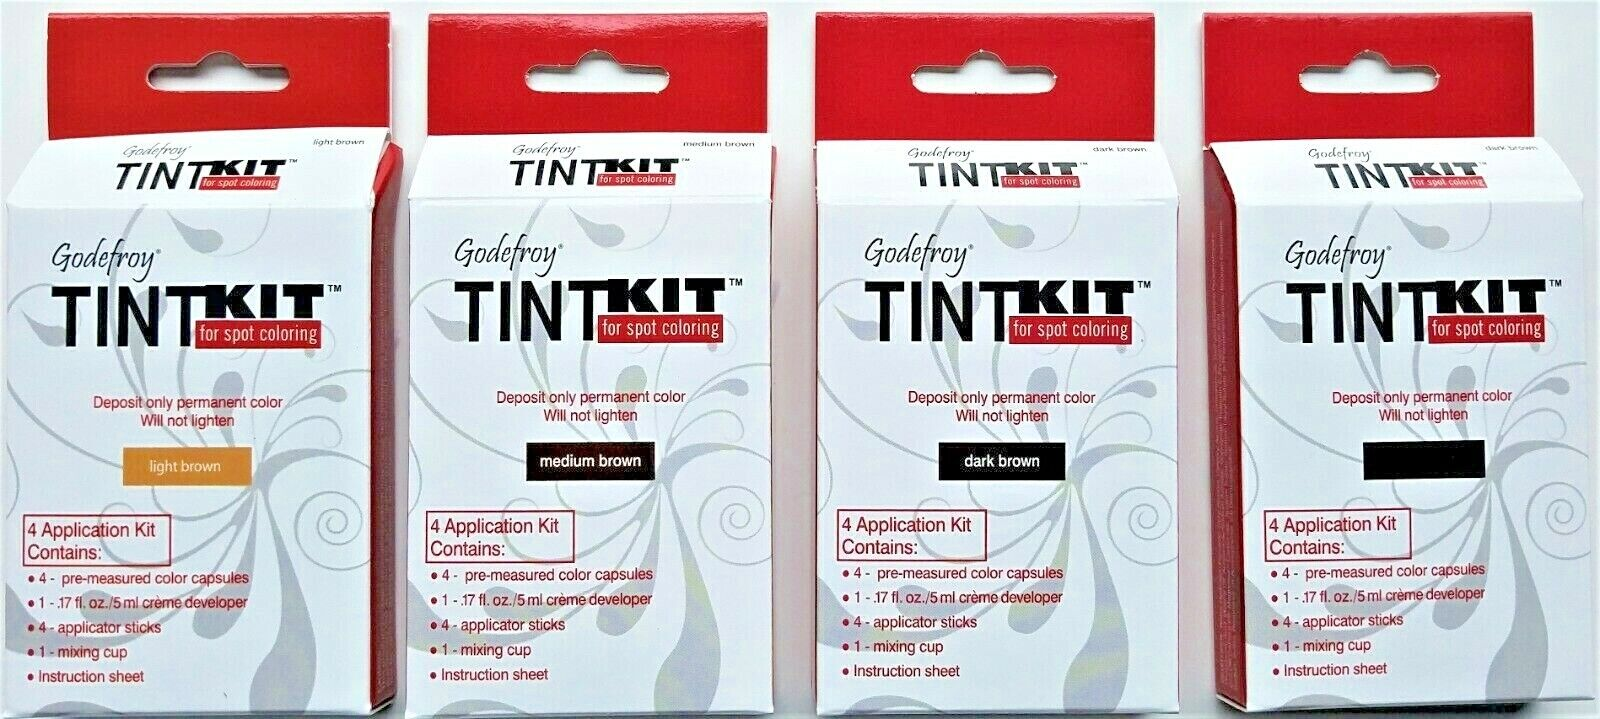 Godefroy TINT KIT Cream Eyebrow Facial Hair Color for Spot Coloring FREE SHIP